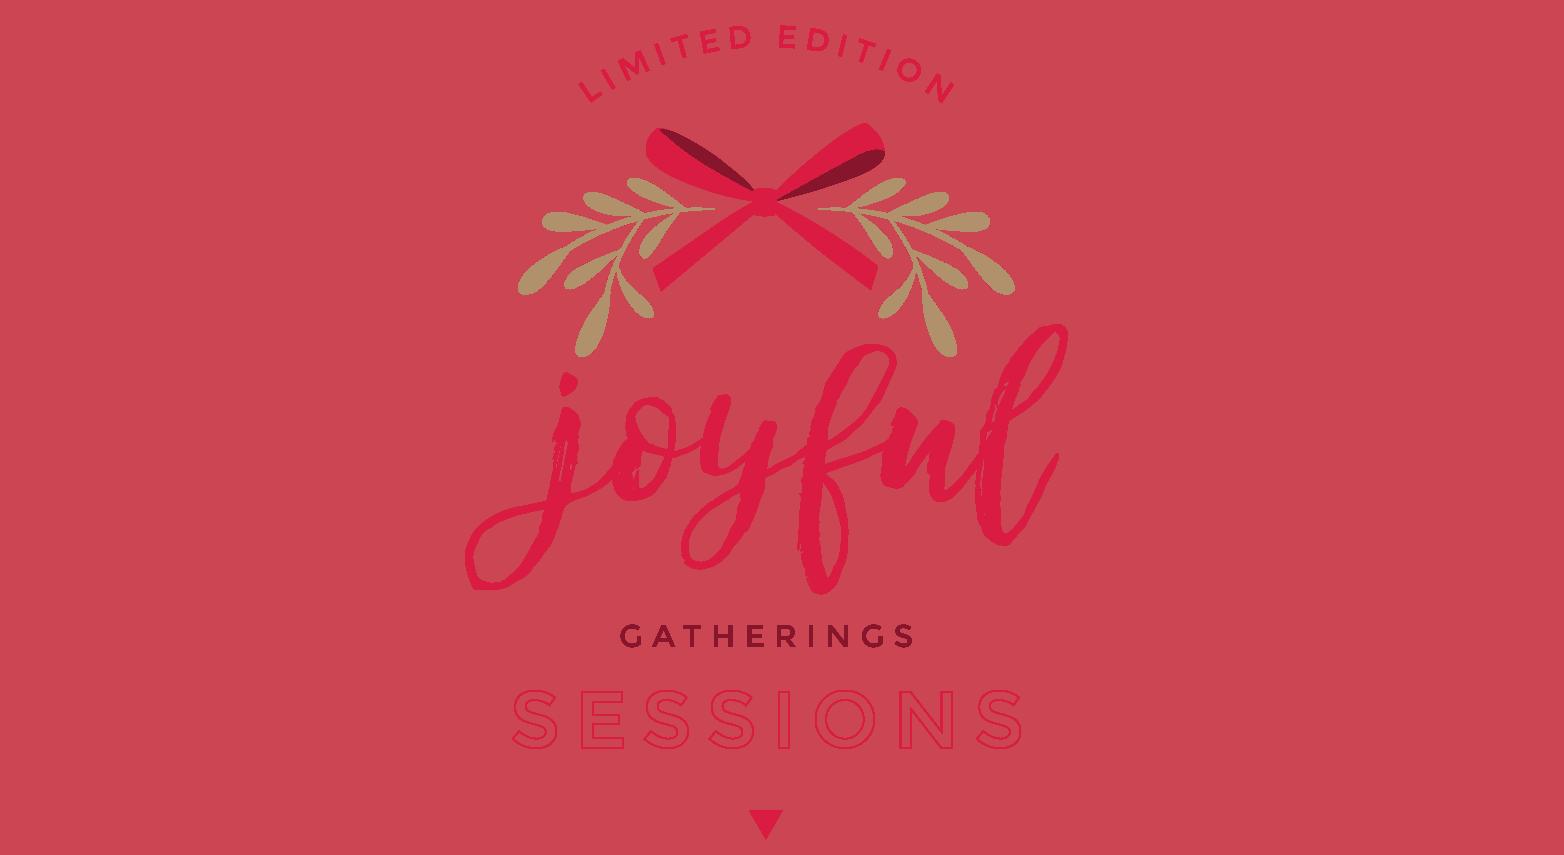 Pictonat Photography Joyful Gatherings